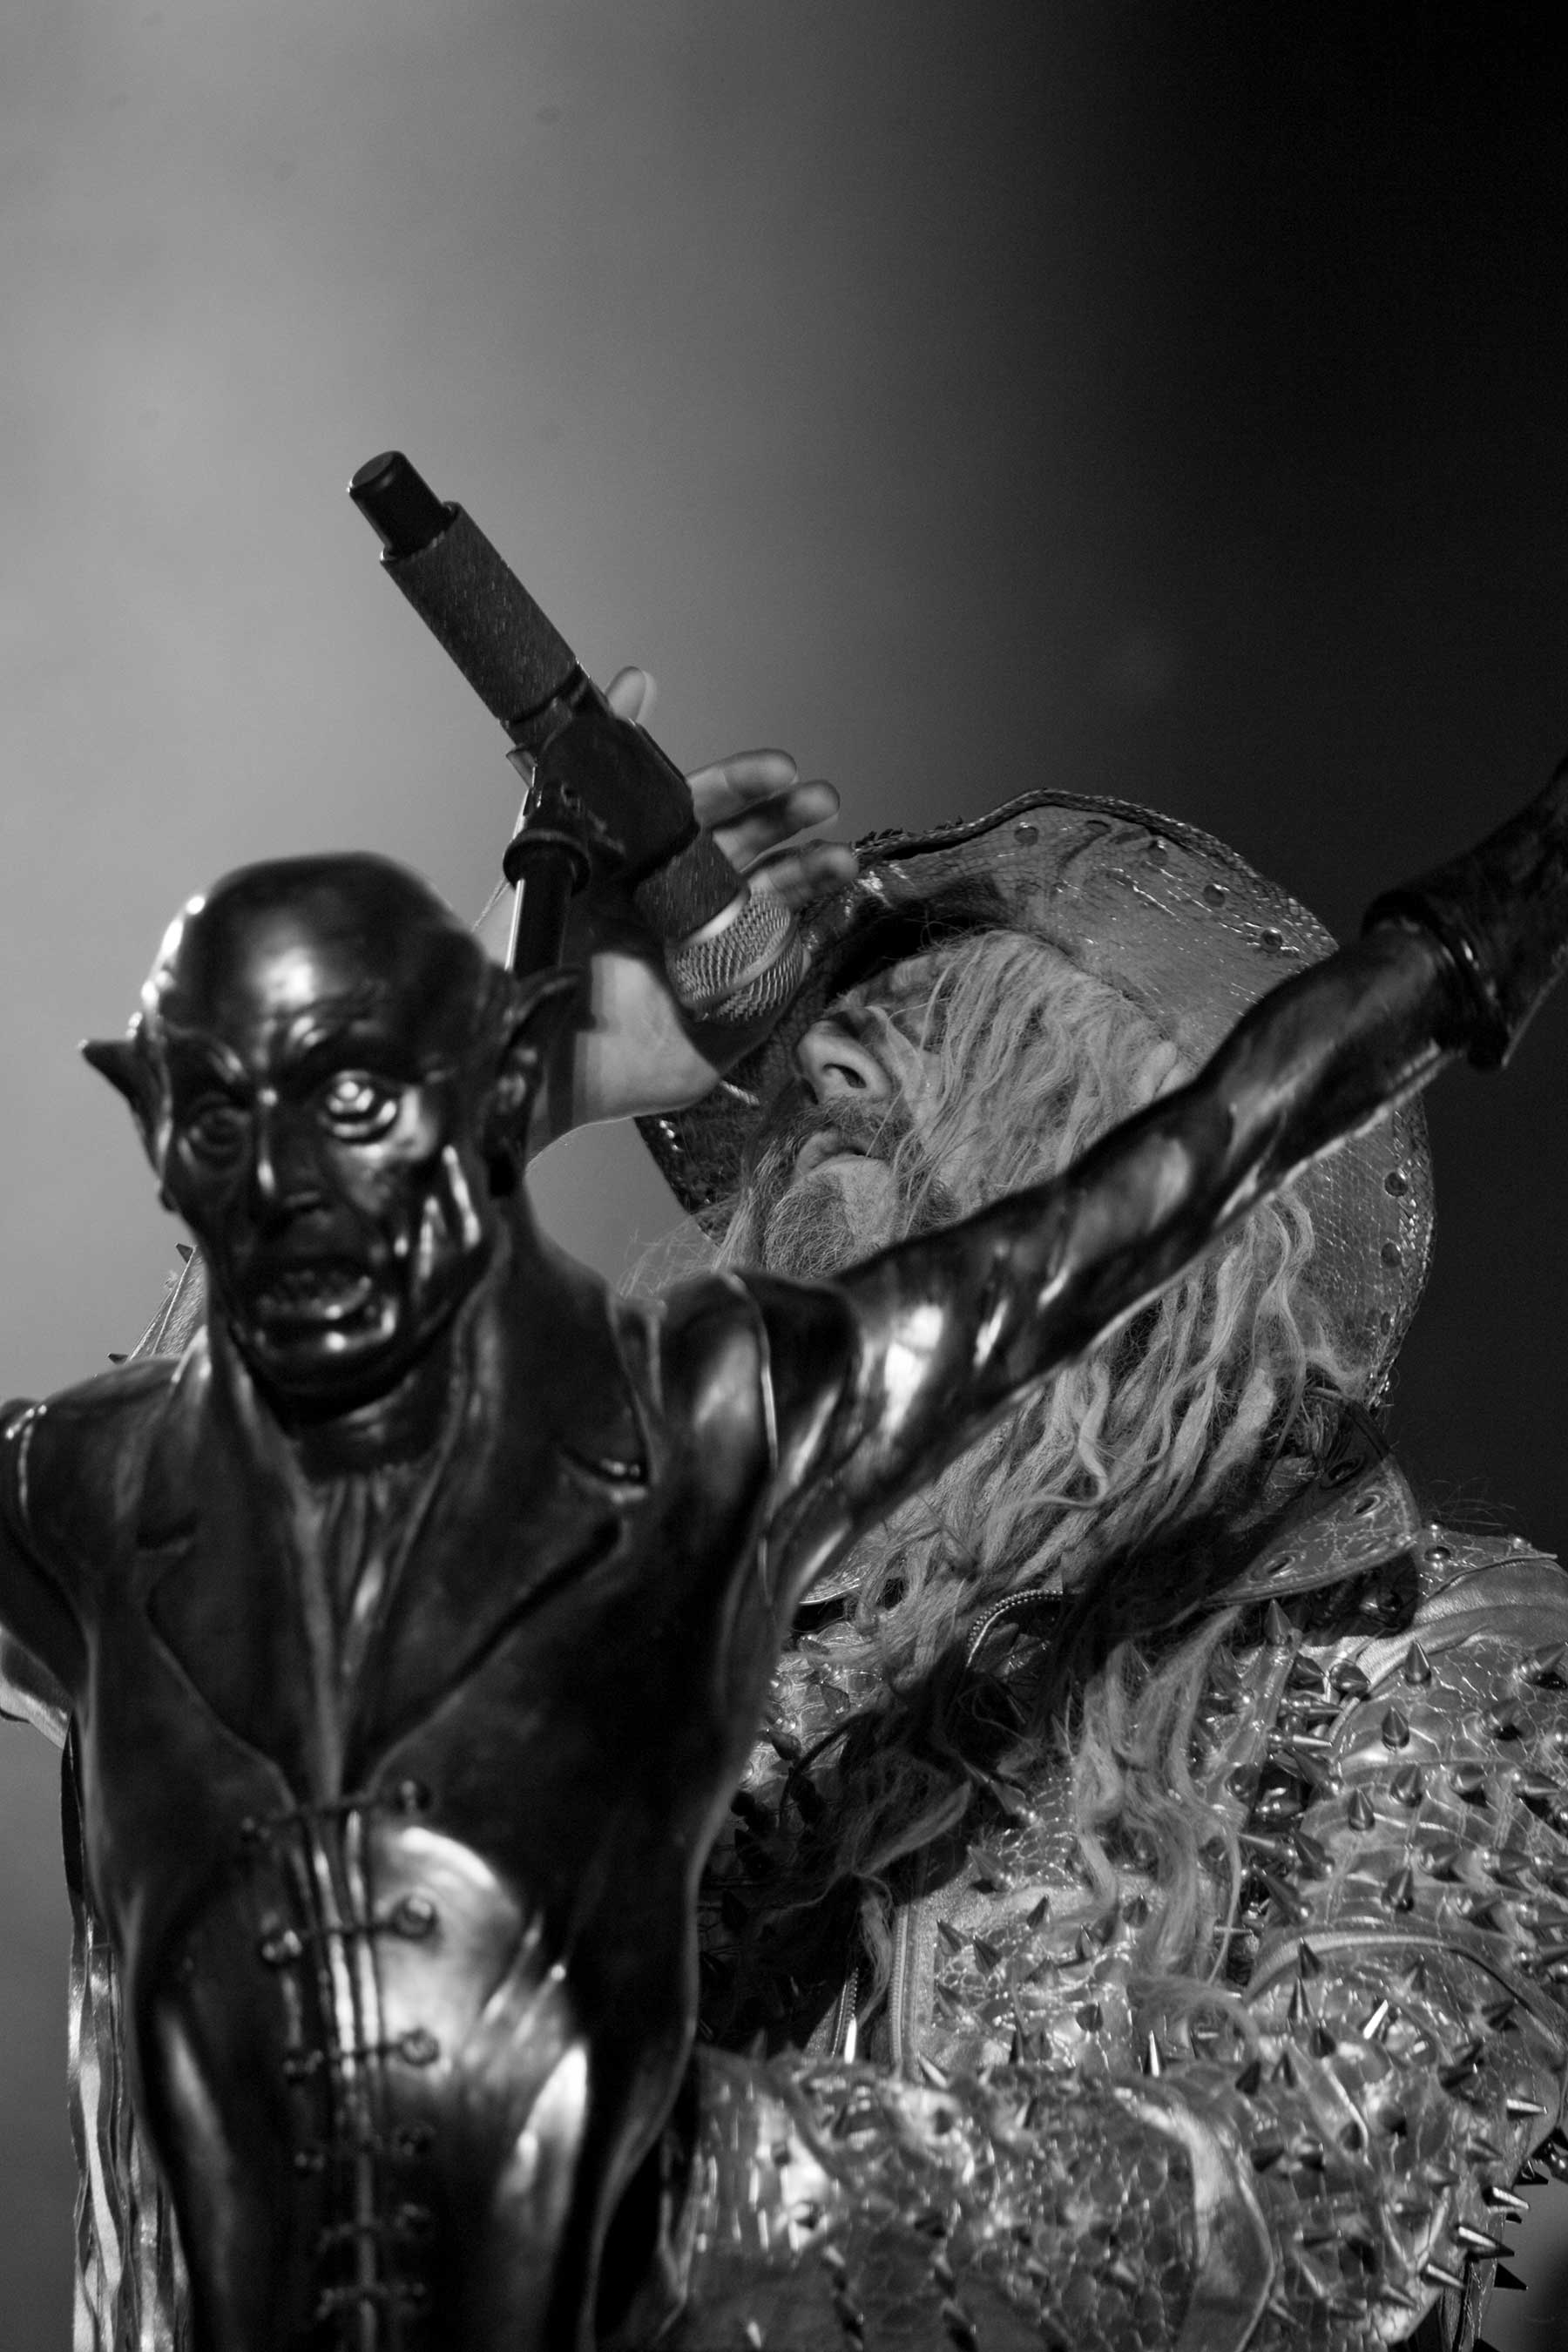 Rob Zombie Photo By Jennifer Pinckney for HM Magazine